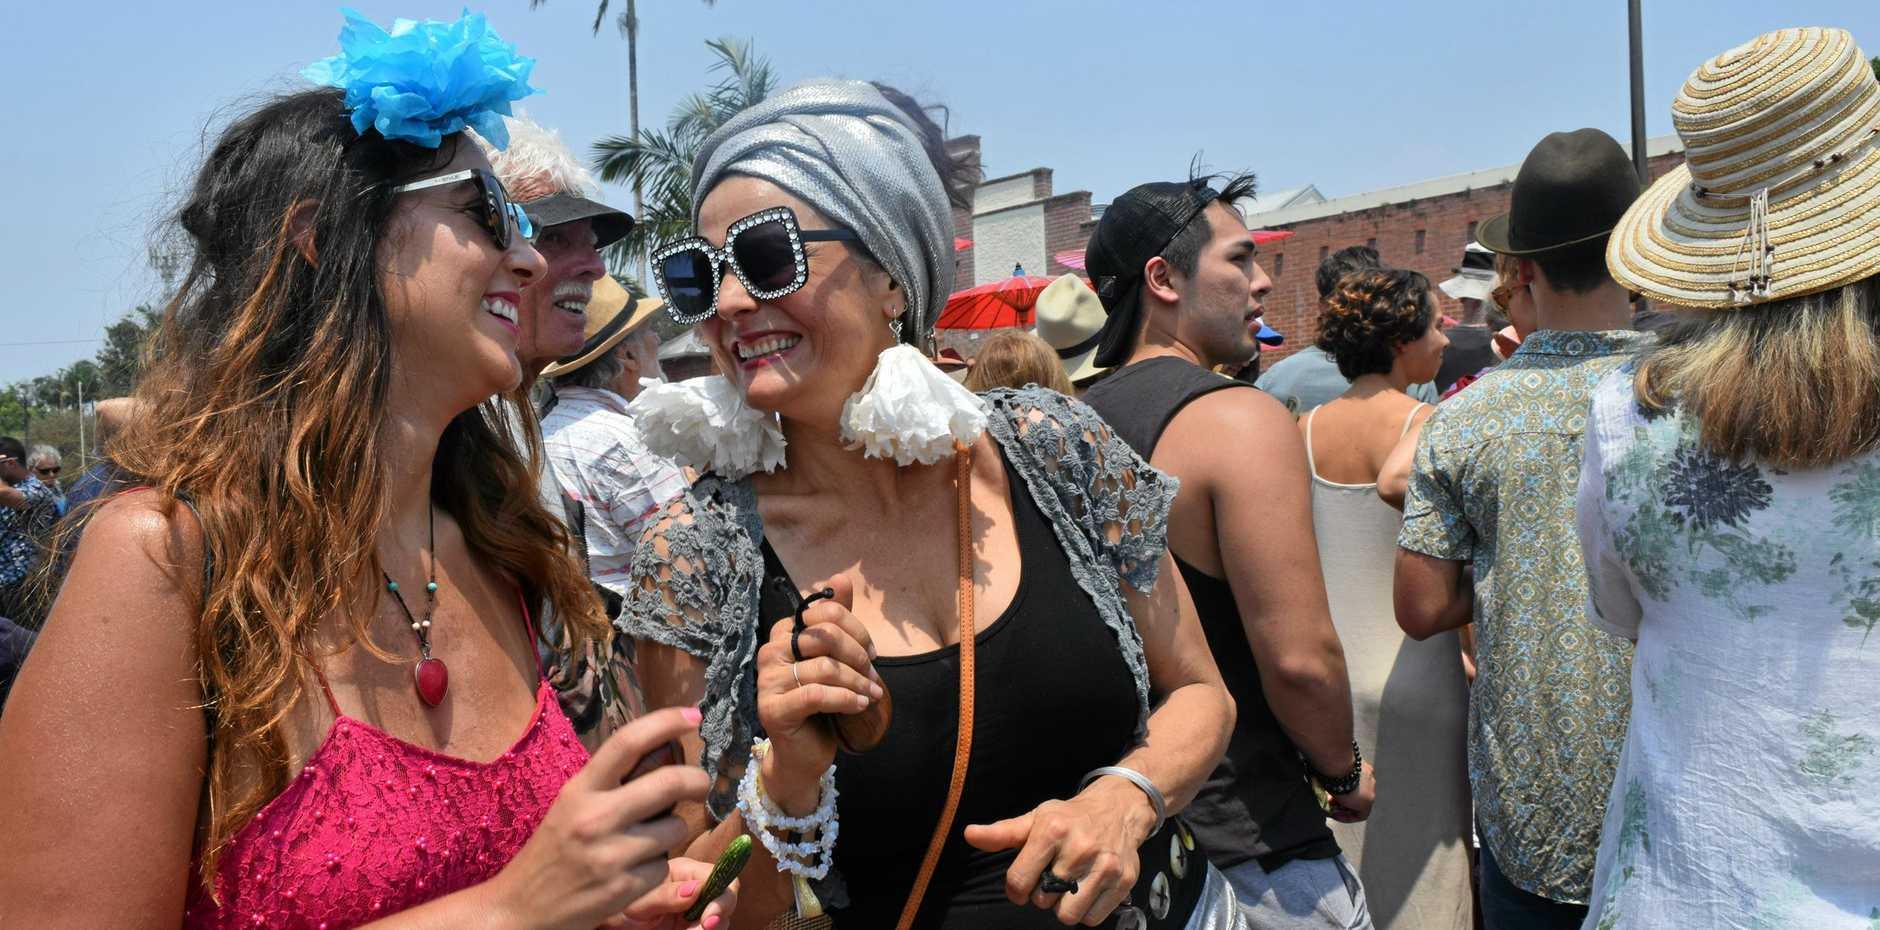 Mullumbimby resident Sharon Shostak brought her friend Spraya Amate (left) from Spain to the experience Mullum Music Festival 2019.